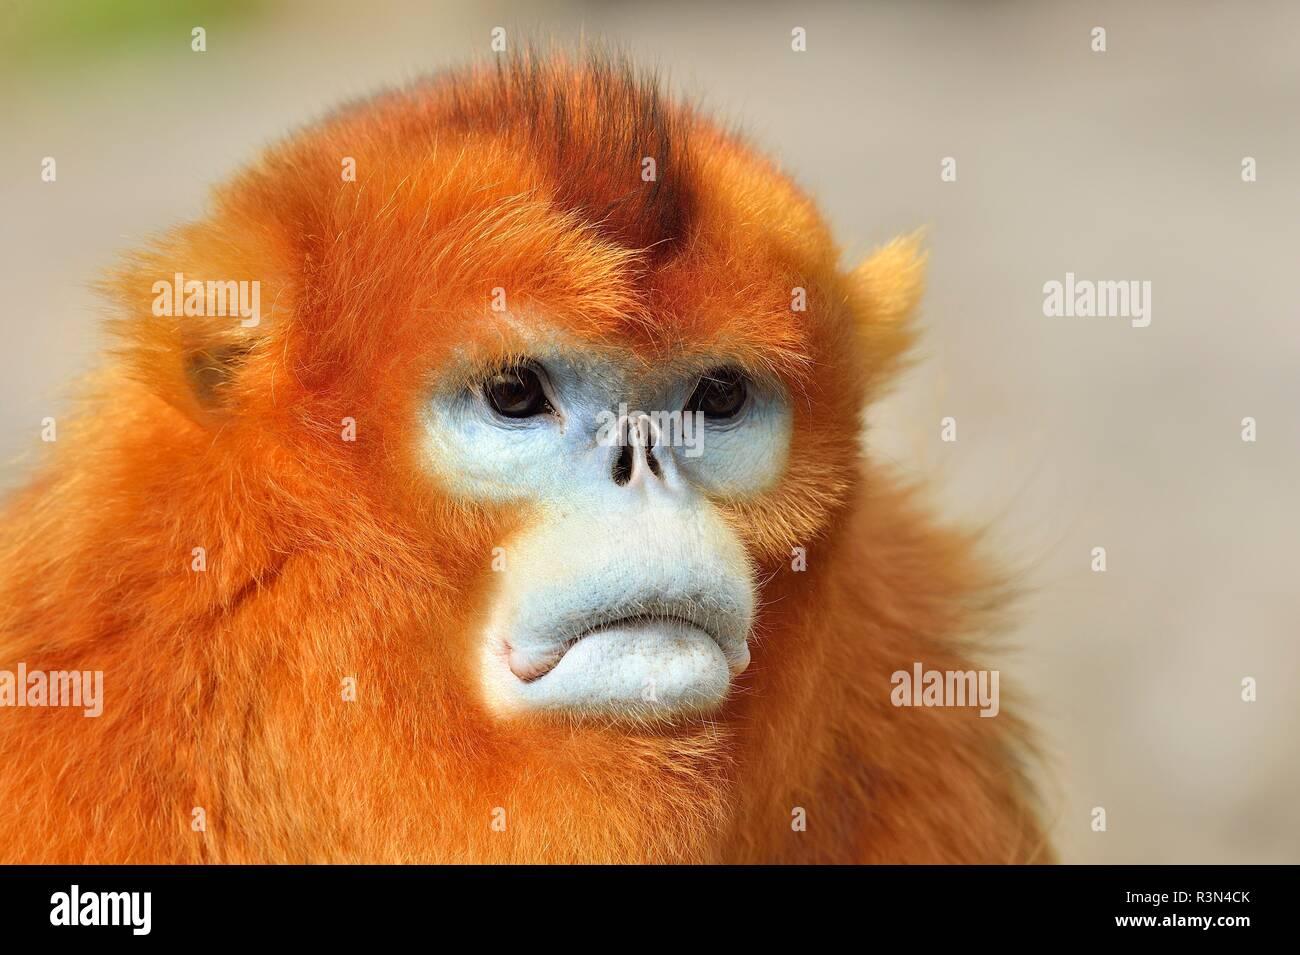 Portrait of Golden snub-nosed monkey (Pygathrix roxellana), Shannxi Province, China - Stock Image